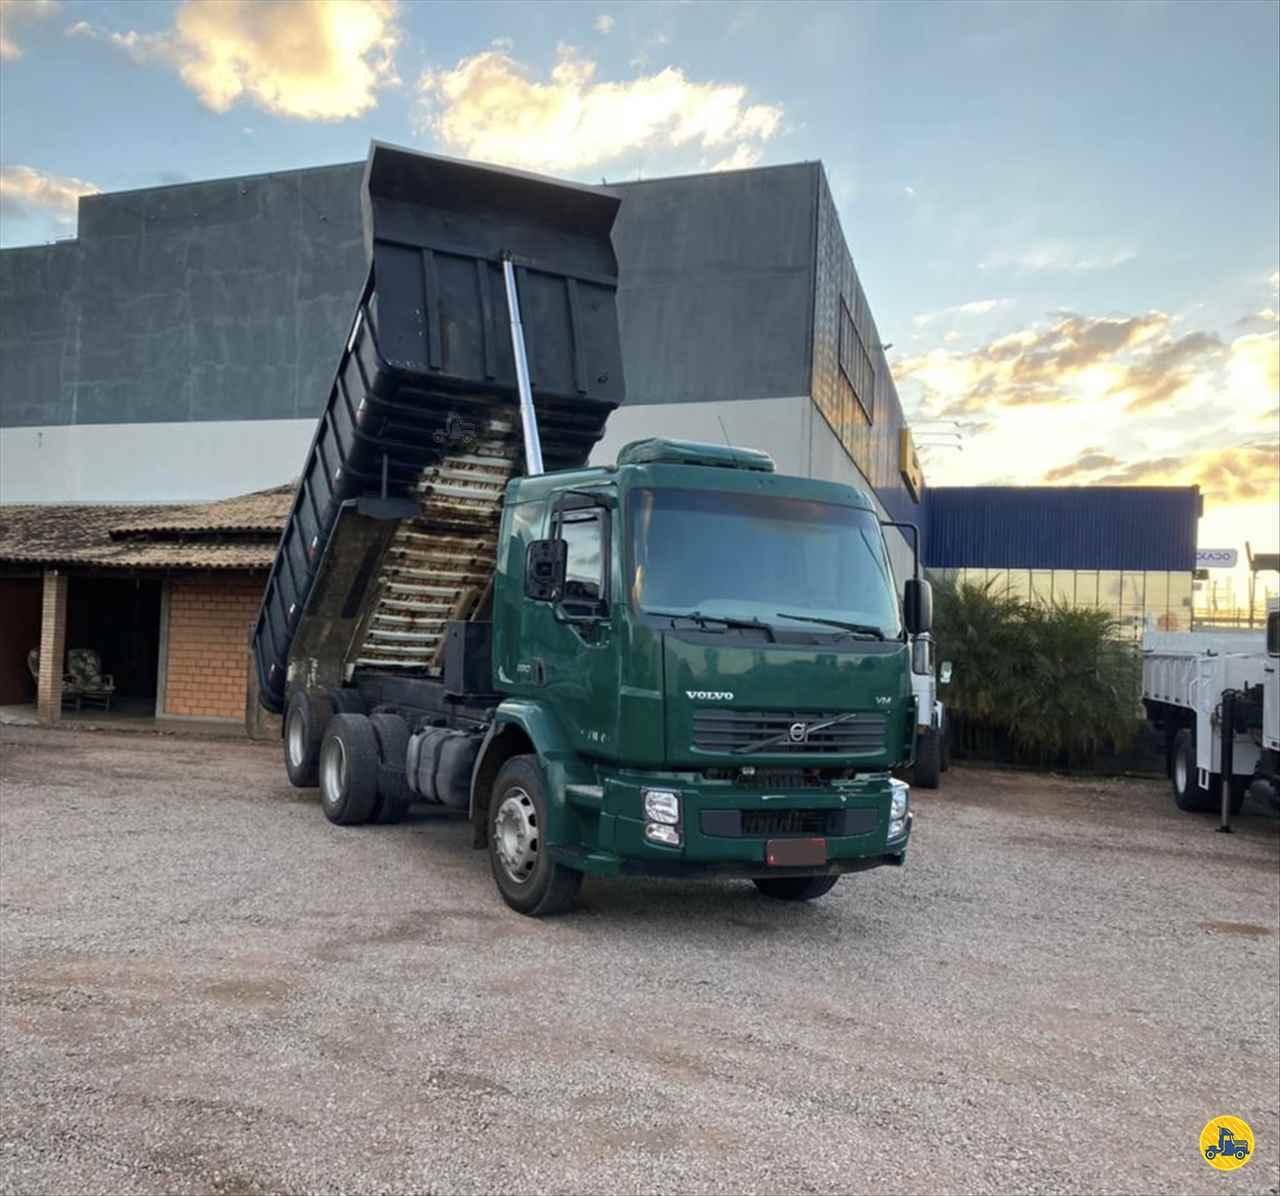 CAMINHAO VOLVO VOLVO VM 260 Caçamba Basculante Truck 6x2 MacTruck CURITIBA PARANÁ PR